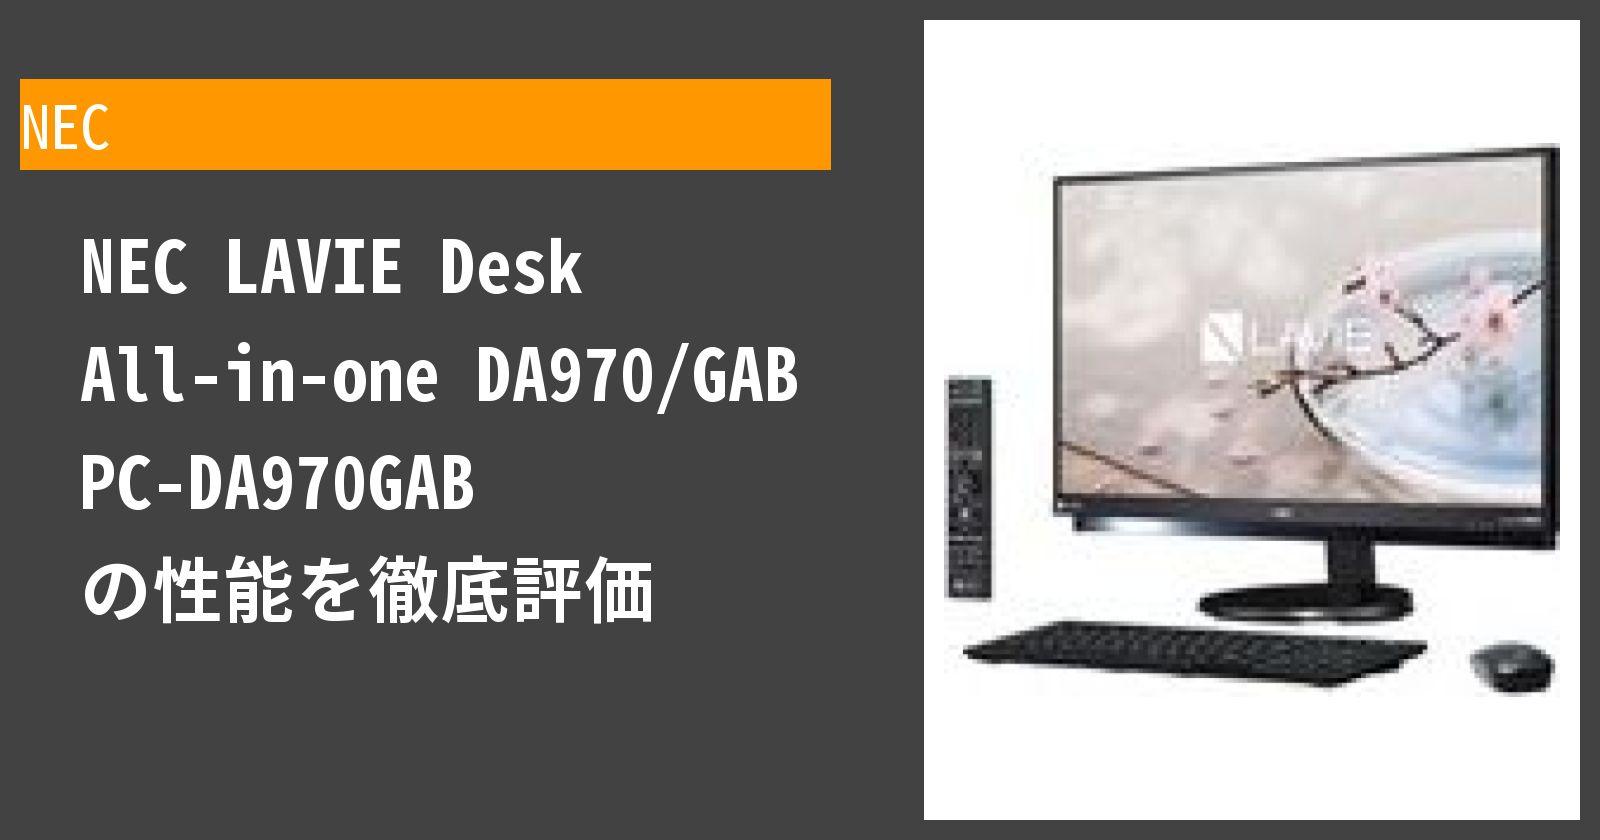 LAVIE Desk(DA970/GAB) の性能を徹底評価